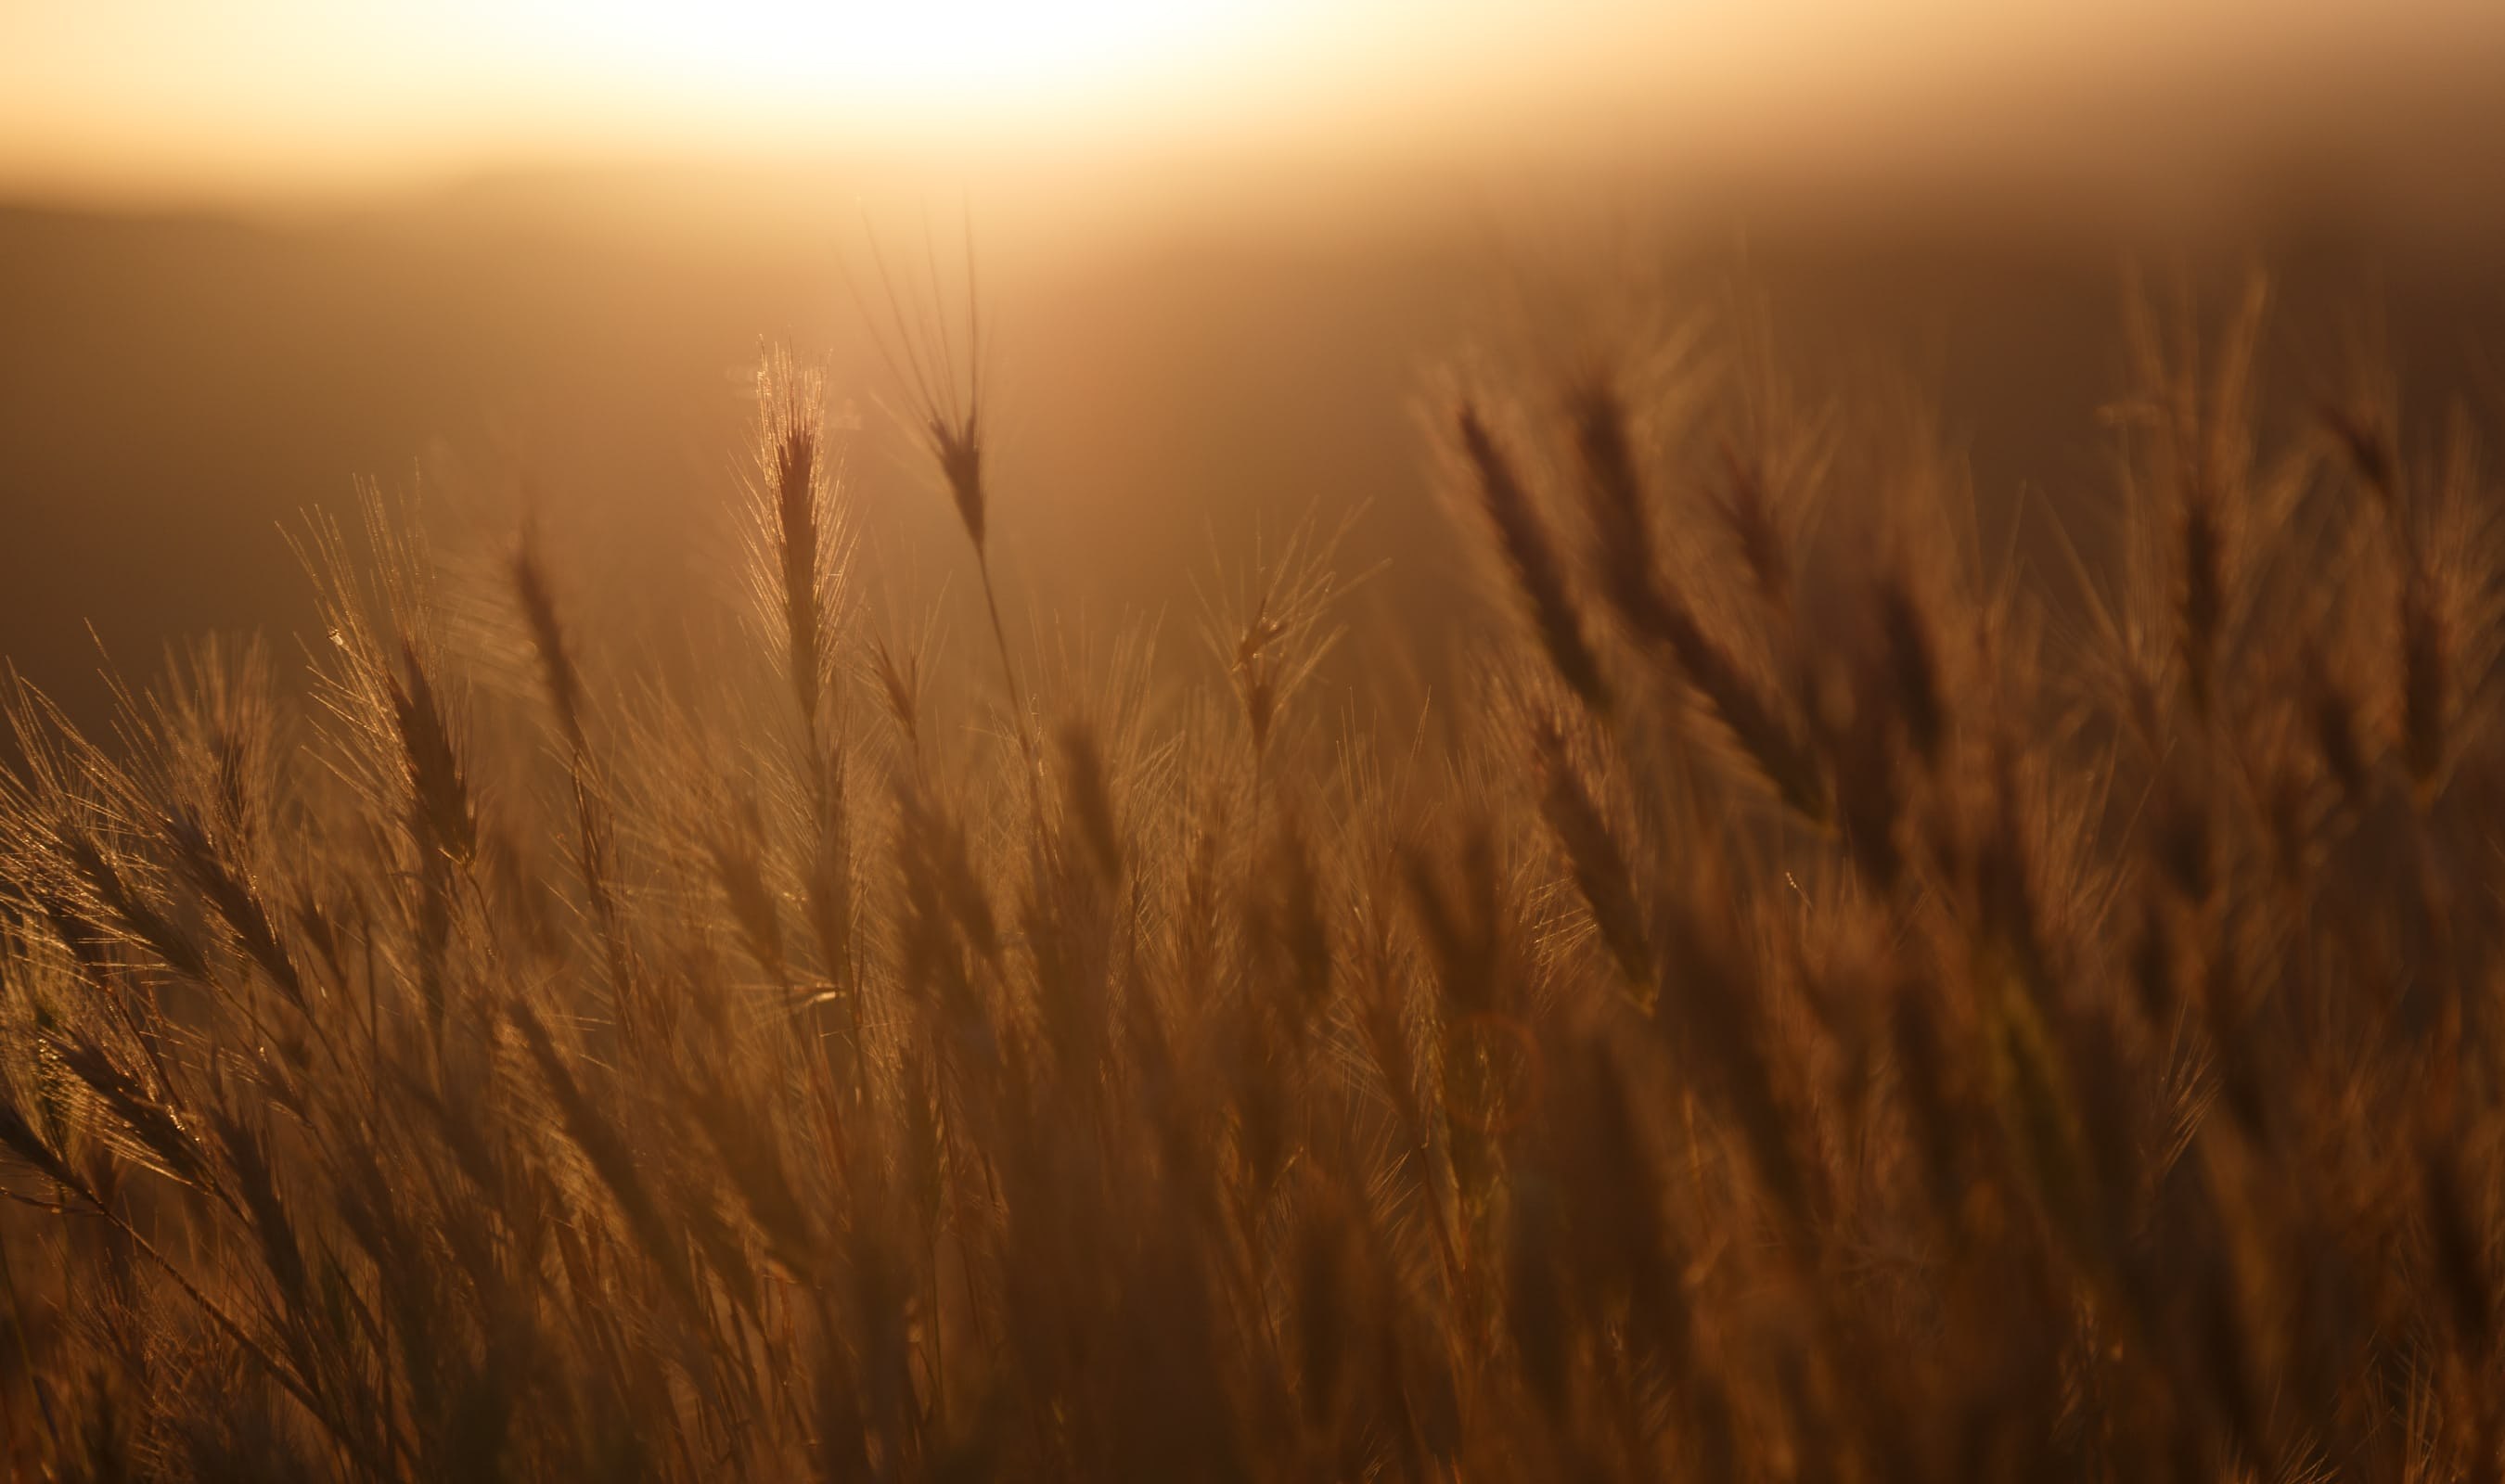 landscape photo tip for beginners for getting good lighting